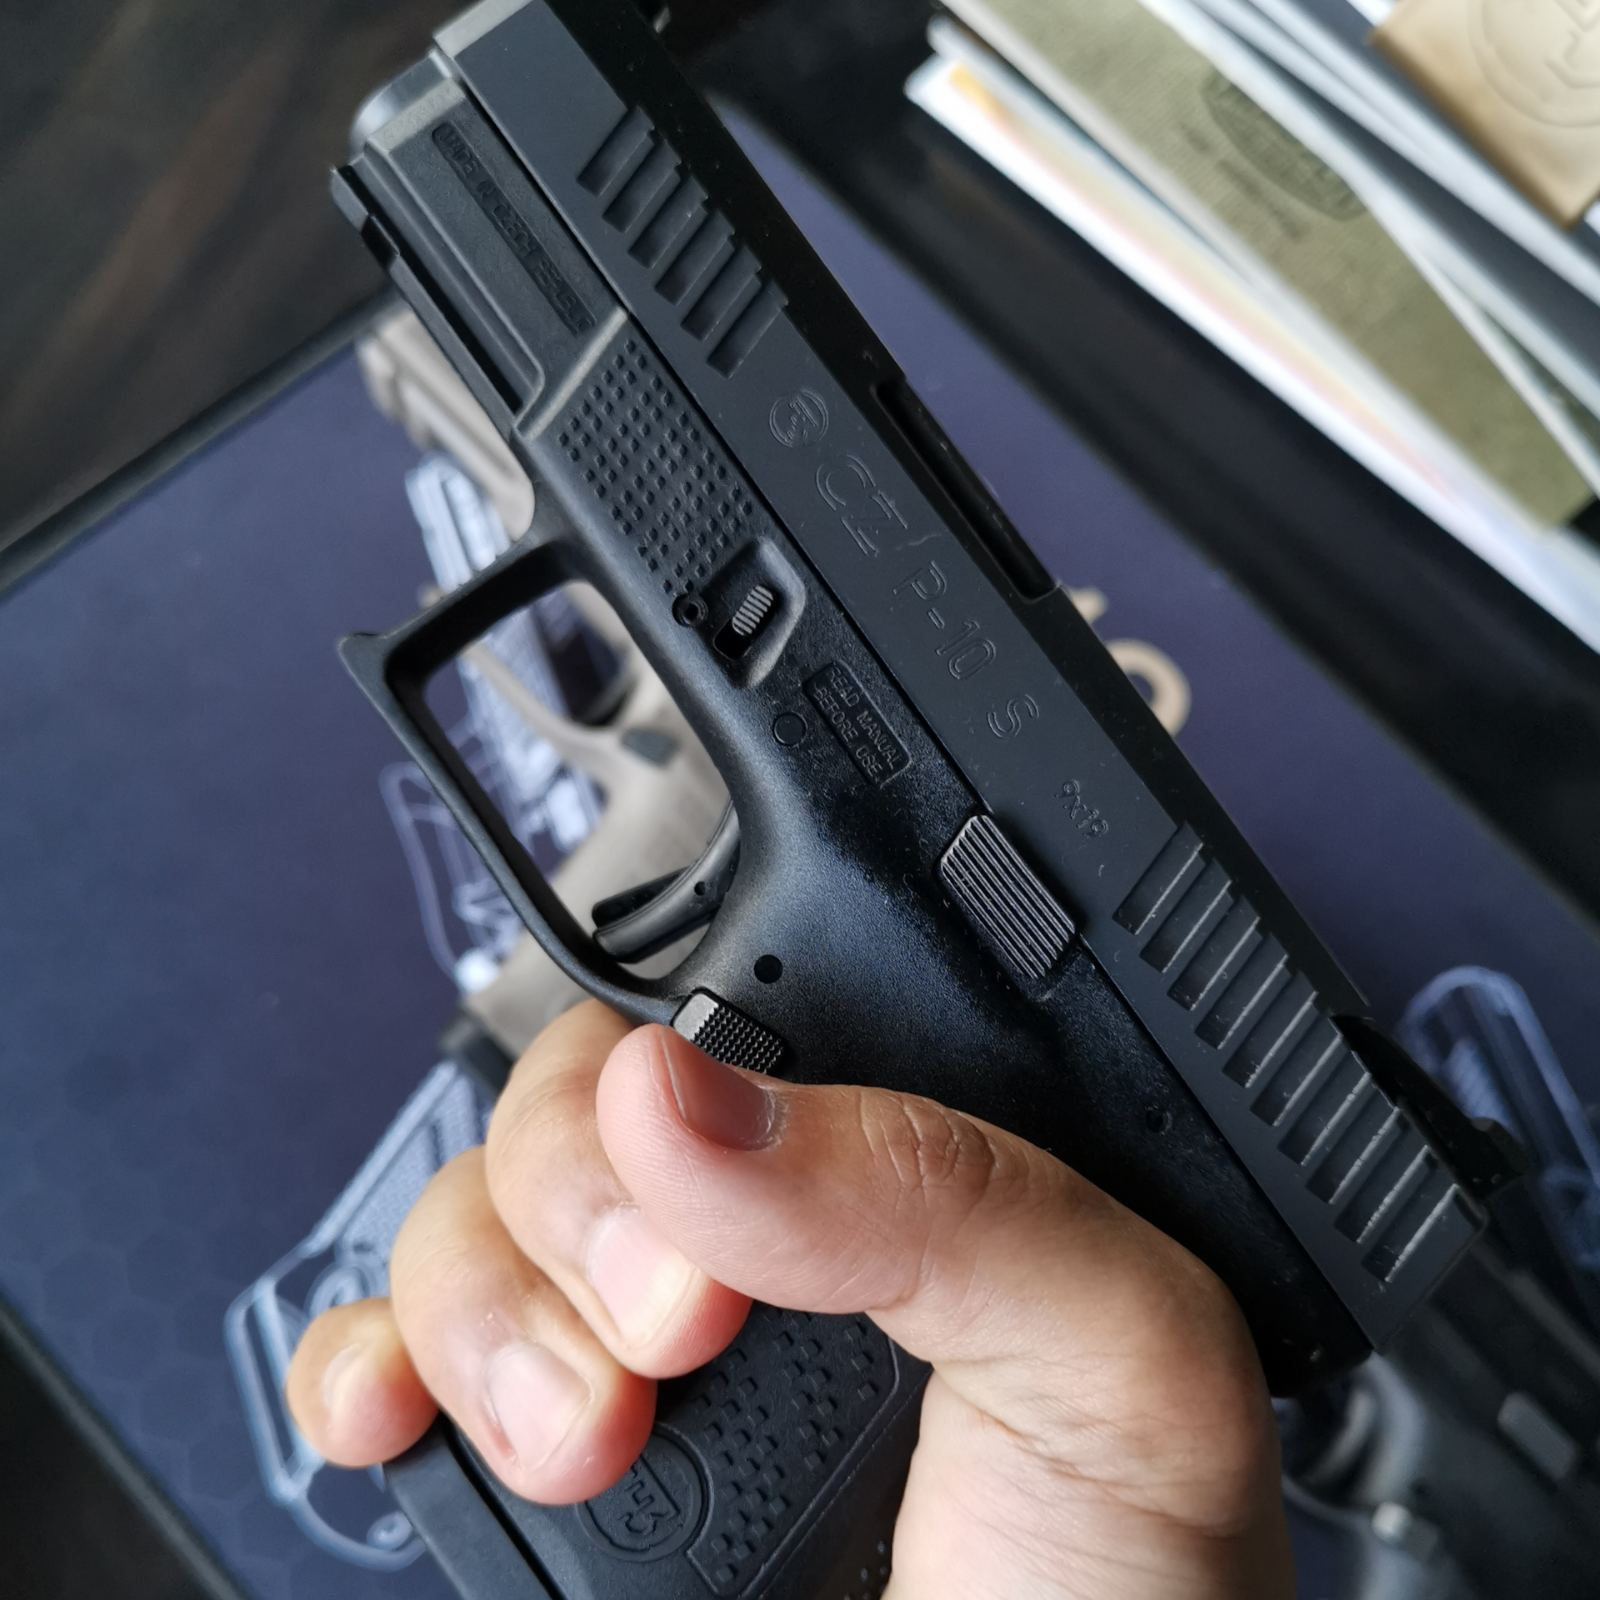 Join the P.B.Dionisio Gun Club to Win a CZ P10 S!